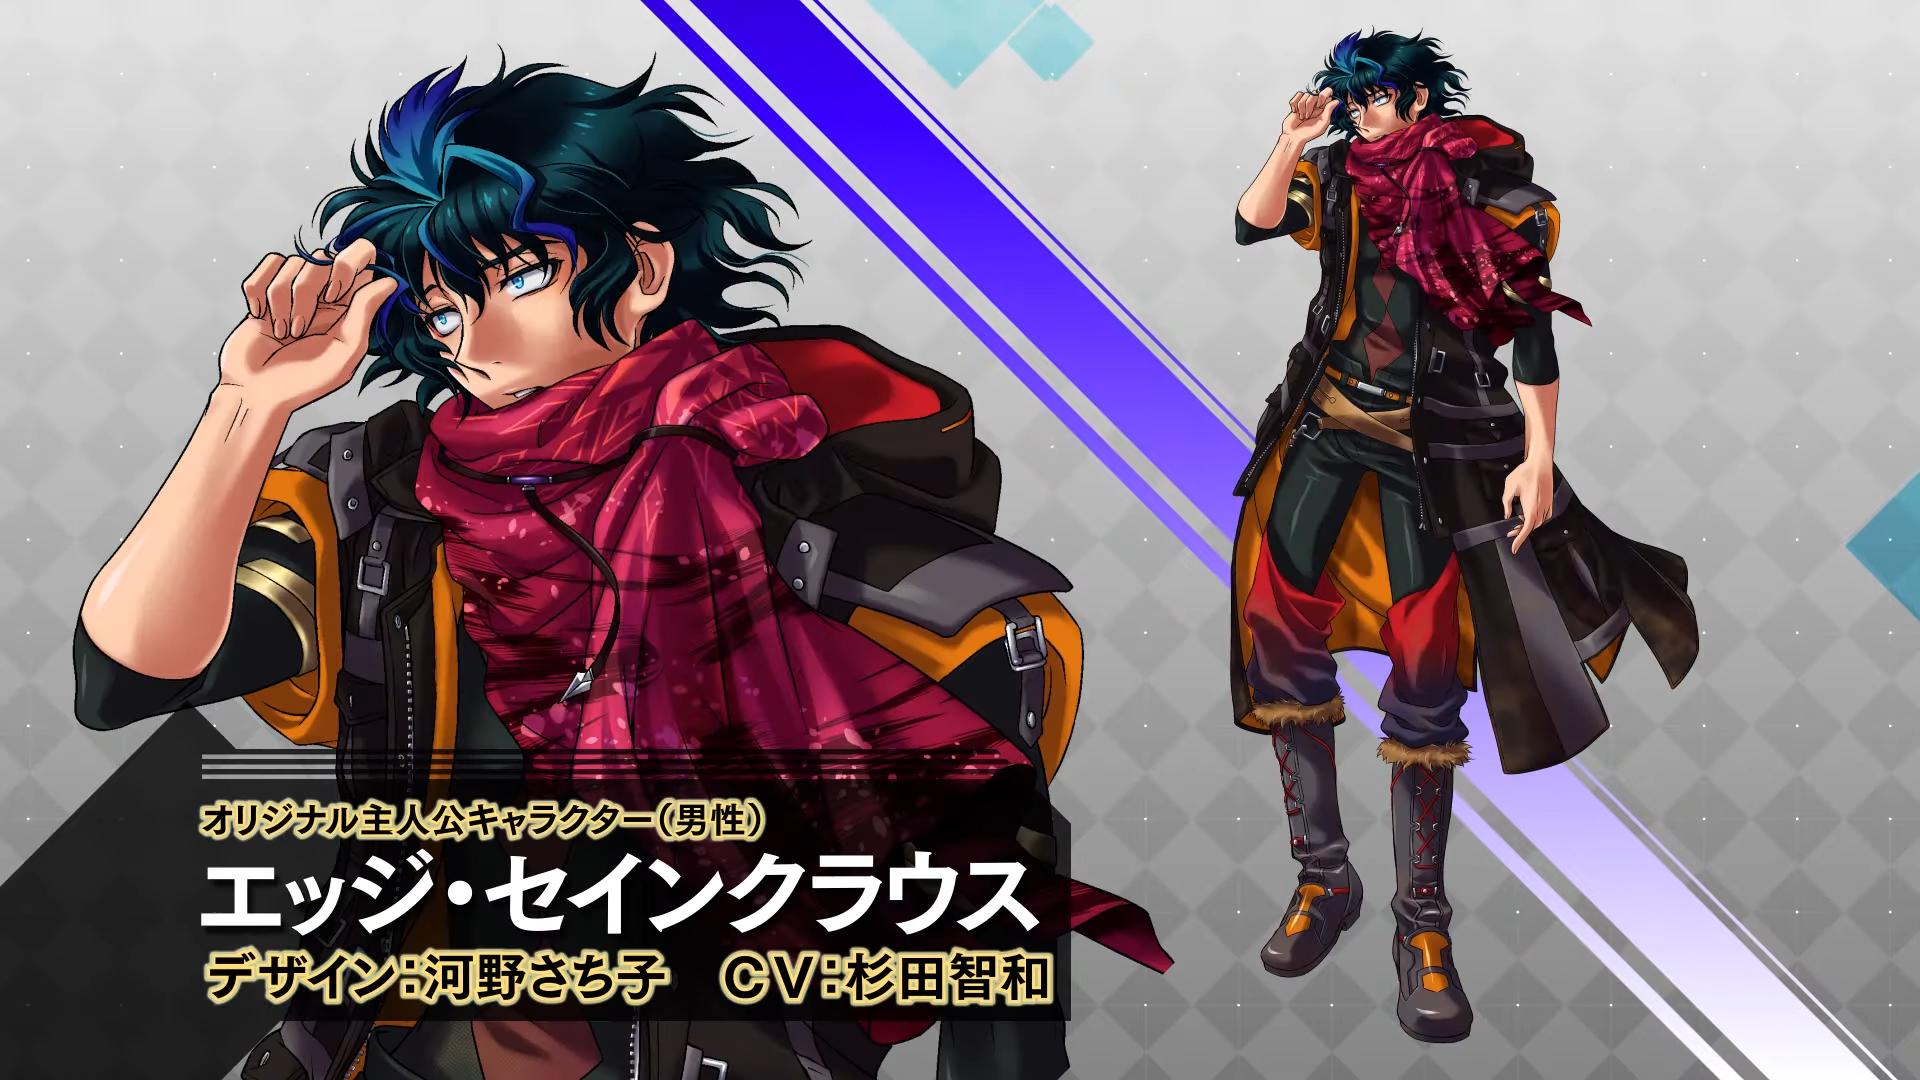 Edge Saintclaus (CV Tomokazu Sugita)